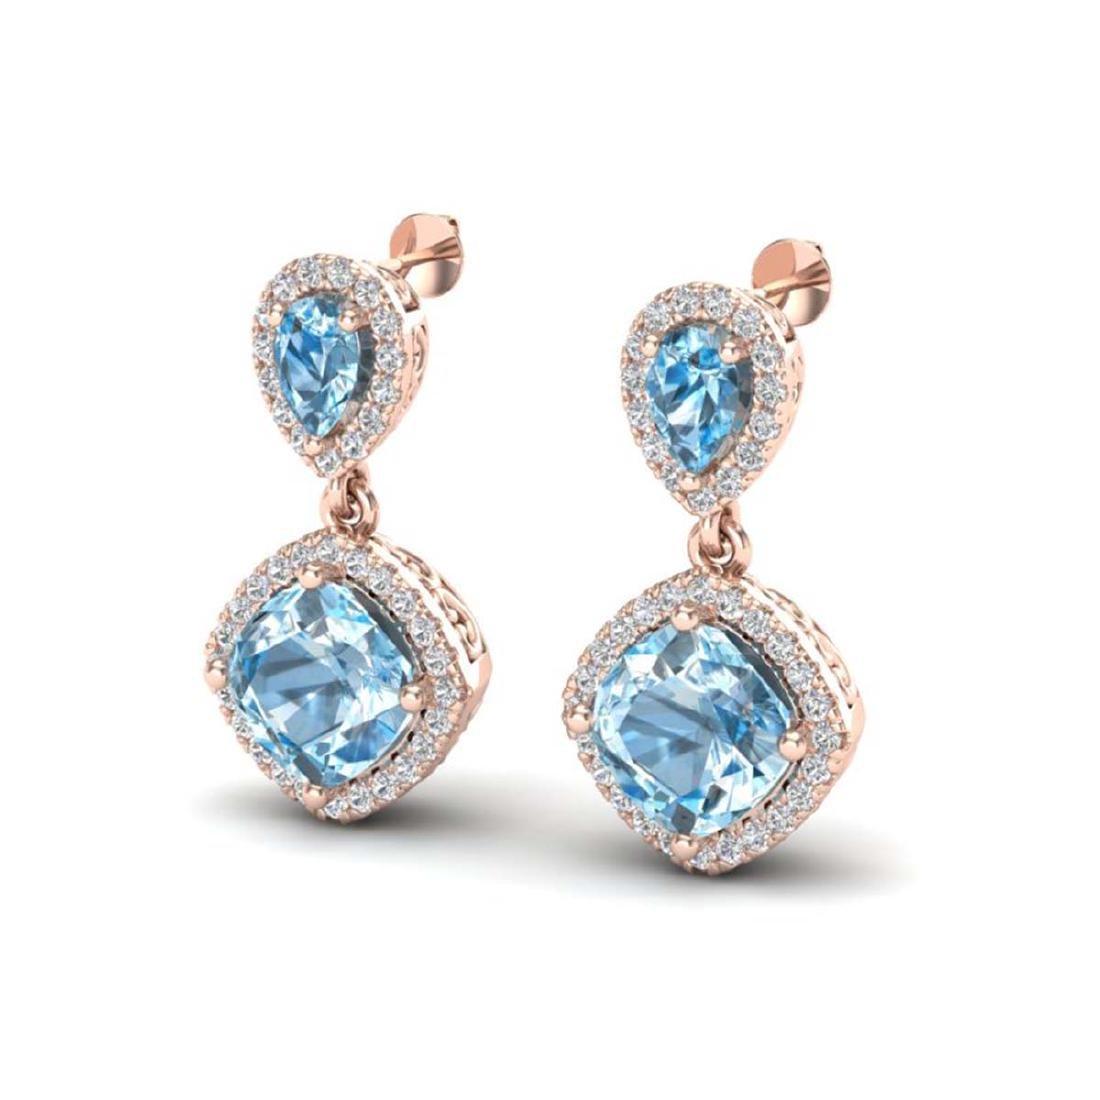 7 CTW Sky Blue Topaz & VS/SI Diamond Earrings Halo Gold